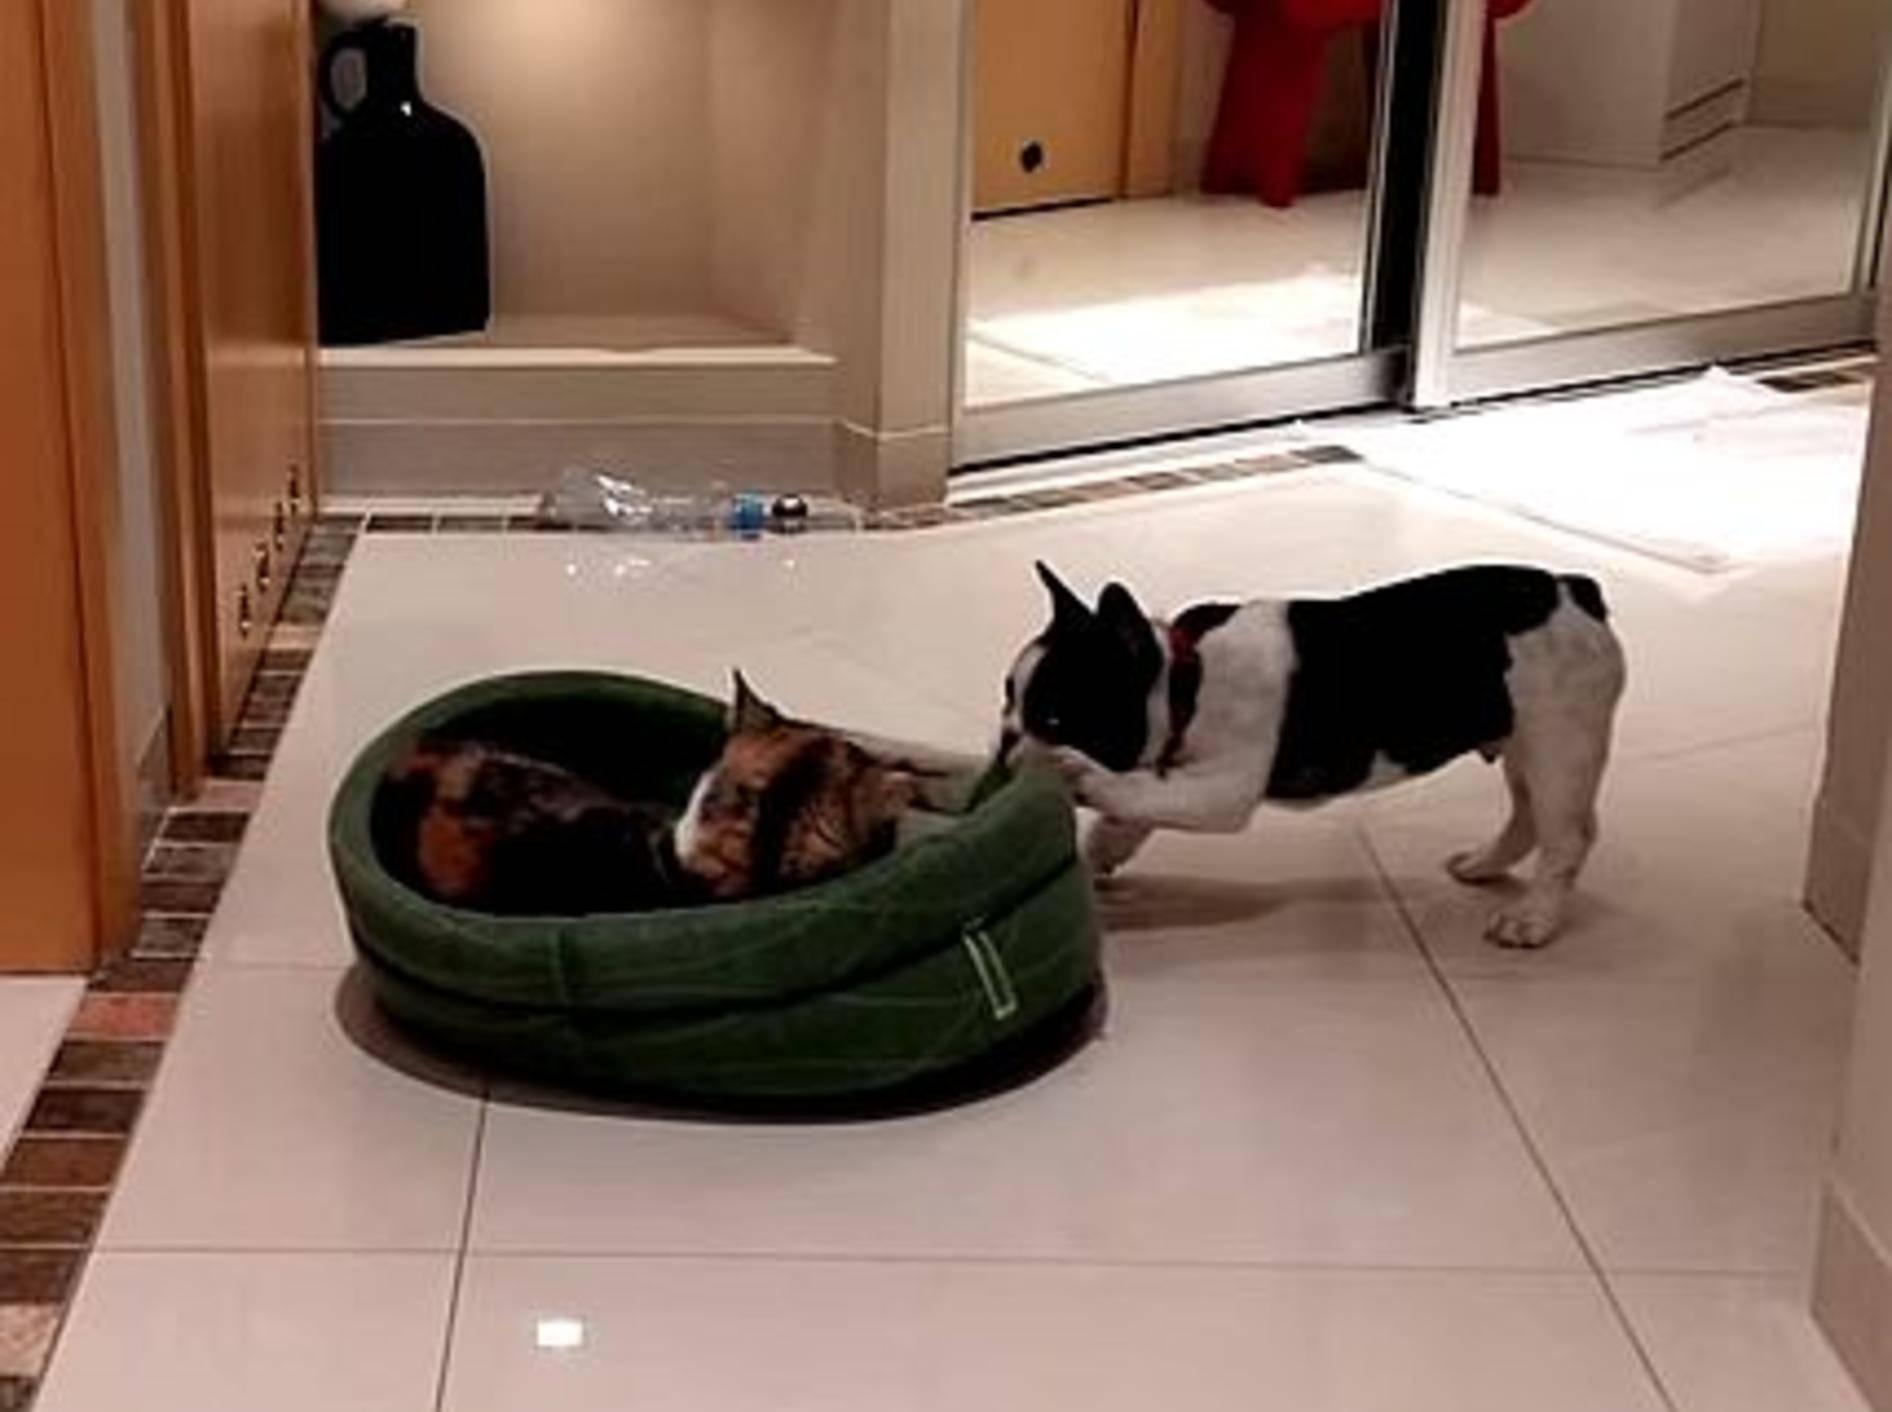 Französische Bulldogge erobert Bett zurück – Bild: Youtube / Pixel